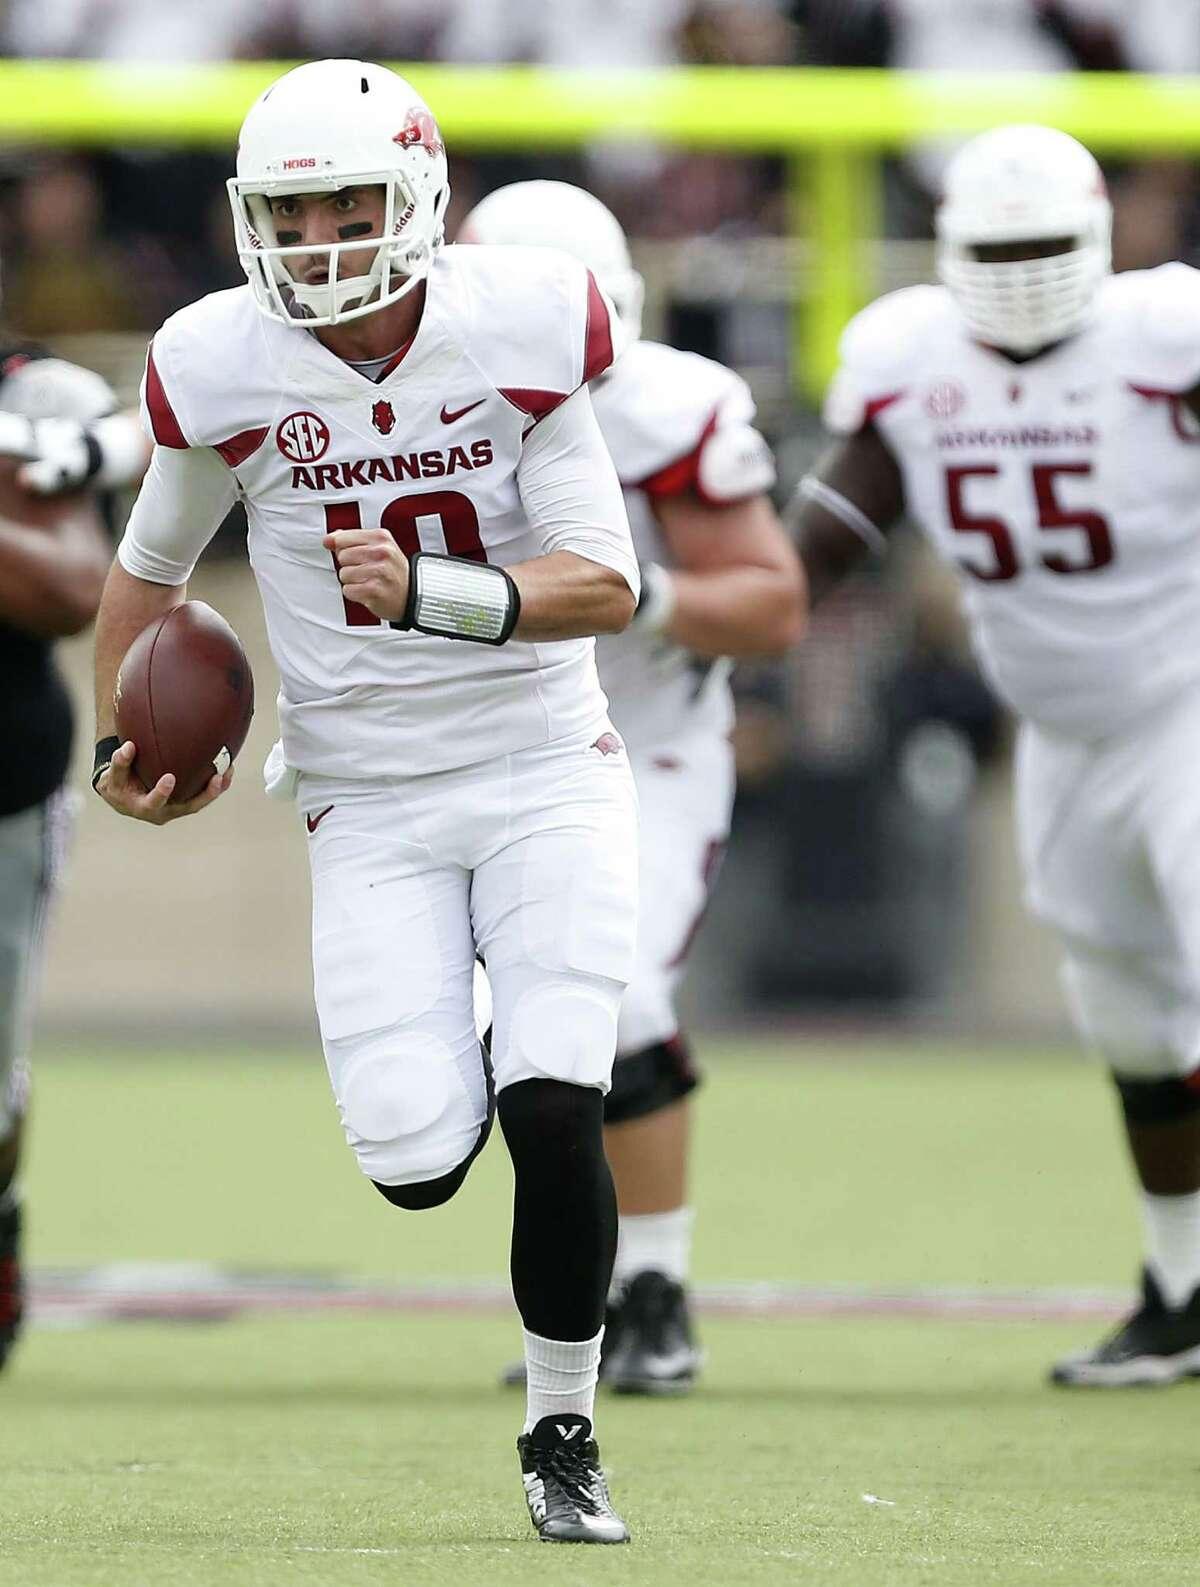 Arkansas' Brandon Allen (10) runs the ball against Texas Tech during an NCAA college football game in Lubbock, Texas, Saturday, Sept. 13, 2014.